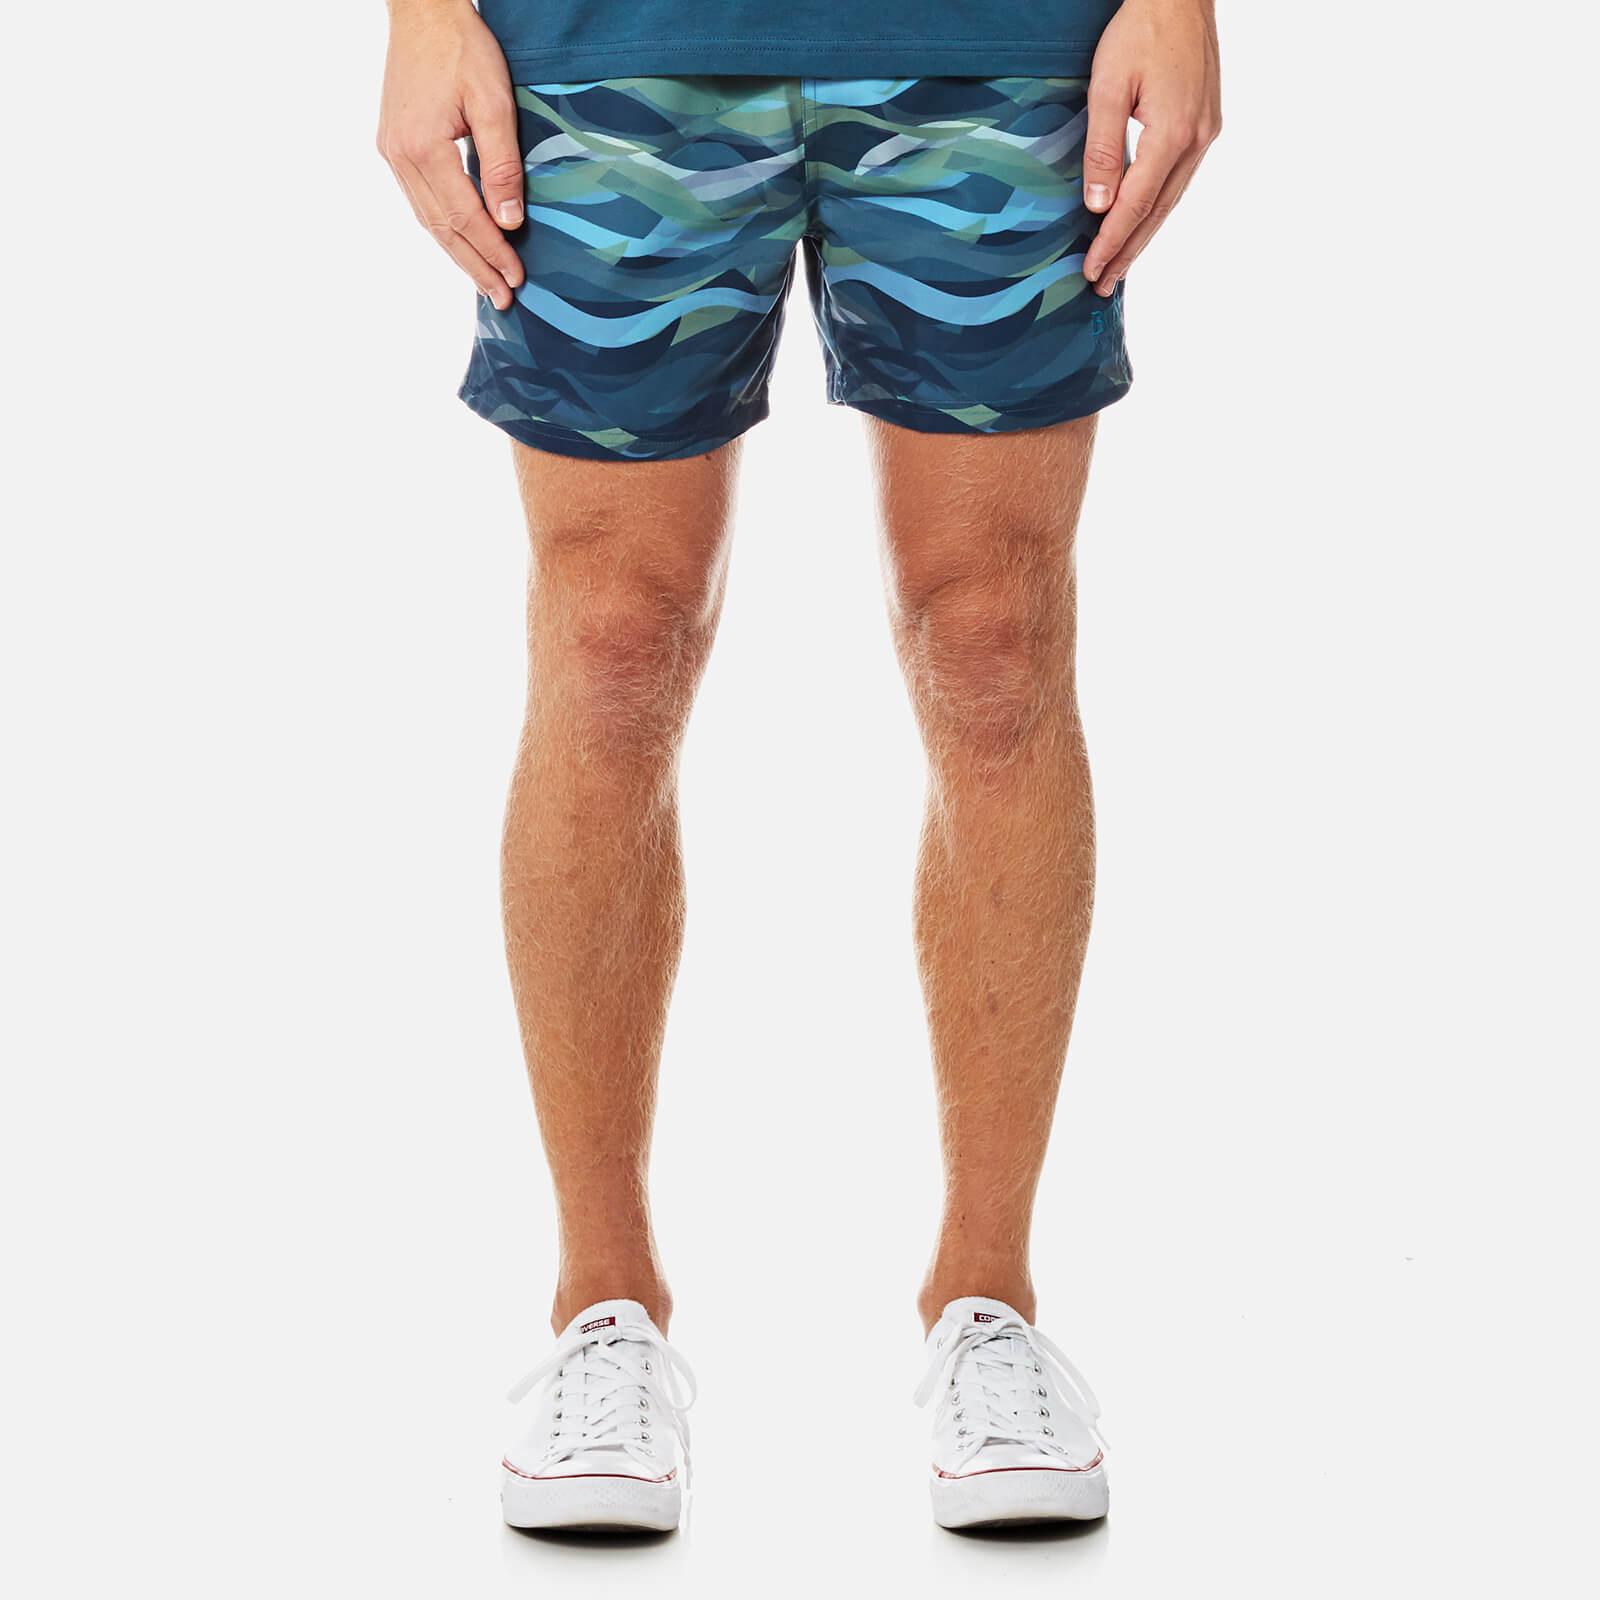 acc28655f9 BOSS Hugo Boss Men's Piranha Swim Shorts - Open Blue - Free UK Delivery  over £50